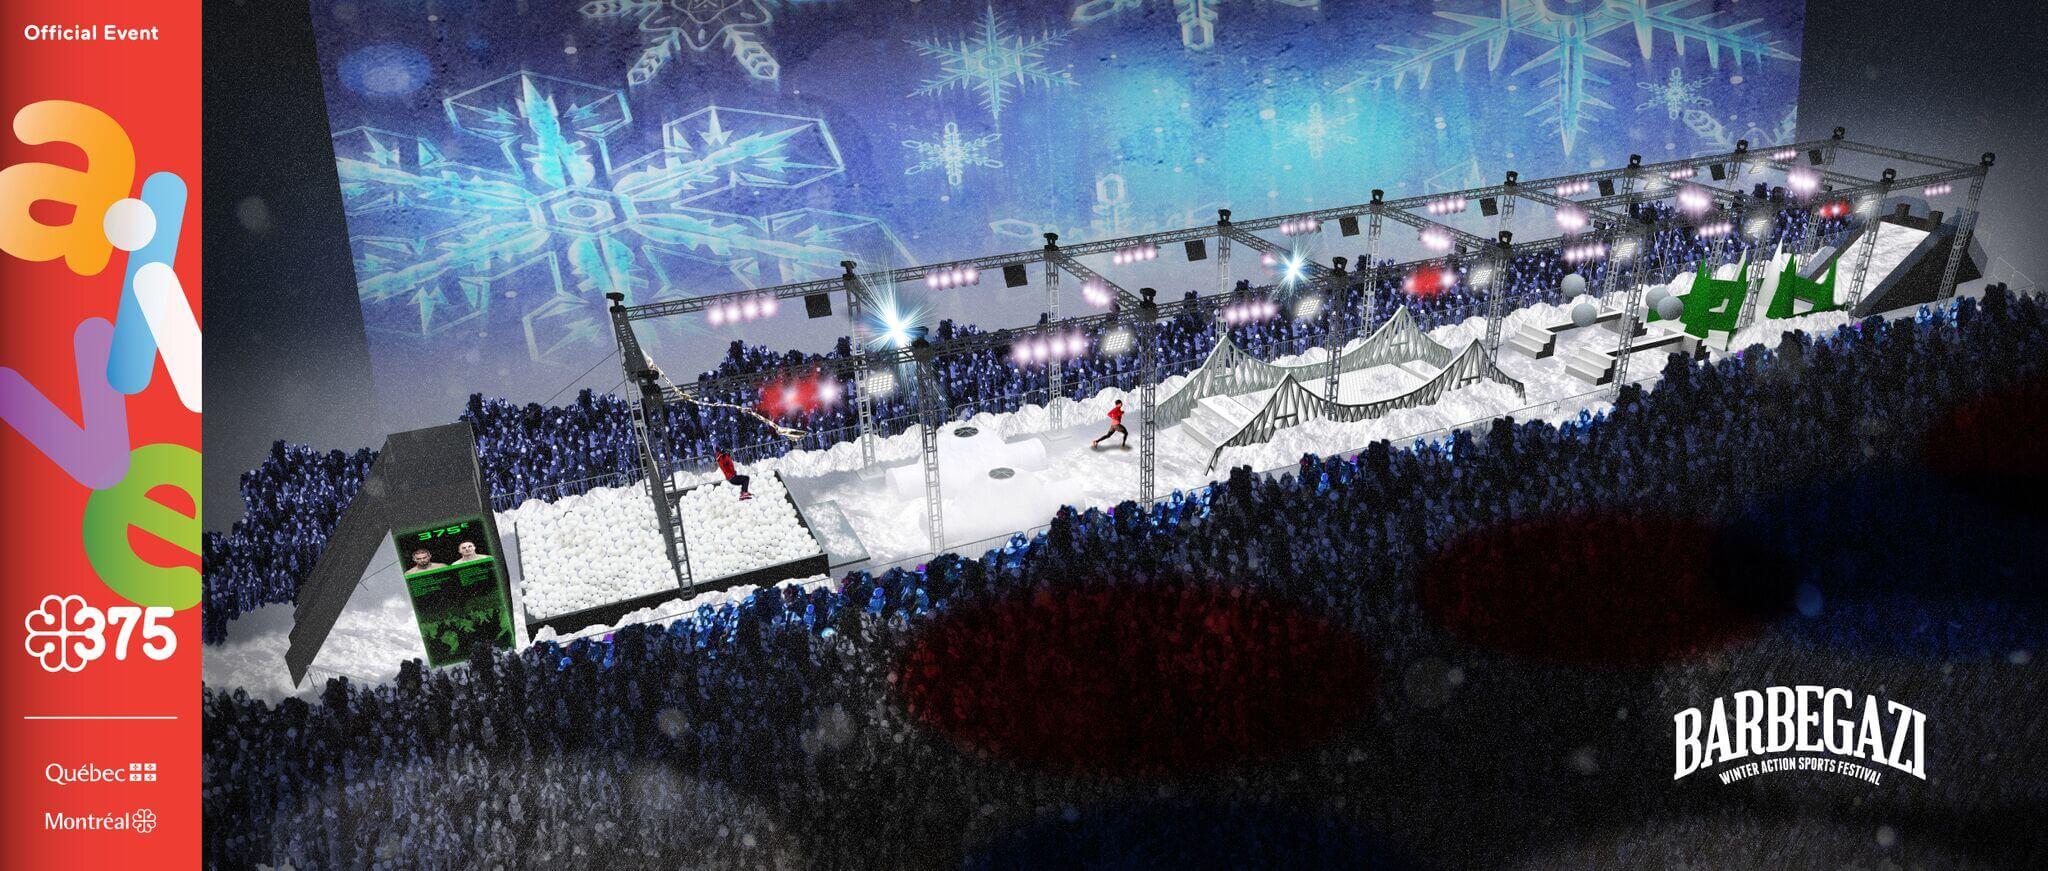 montreal-barbegazi-winter-action-sports-festival